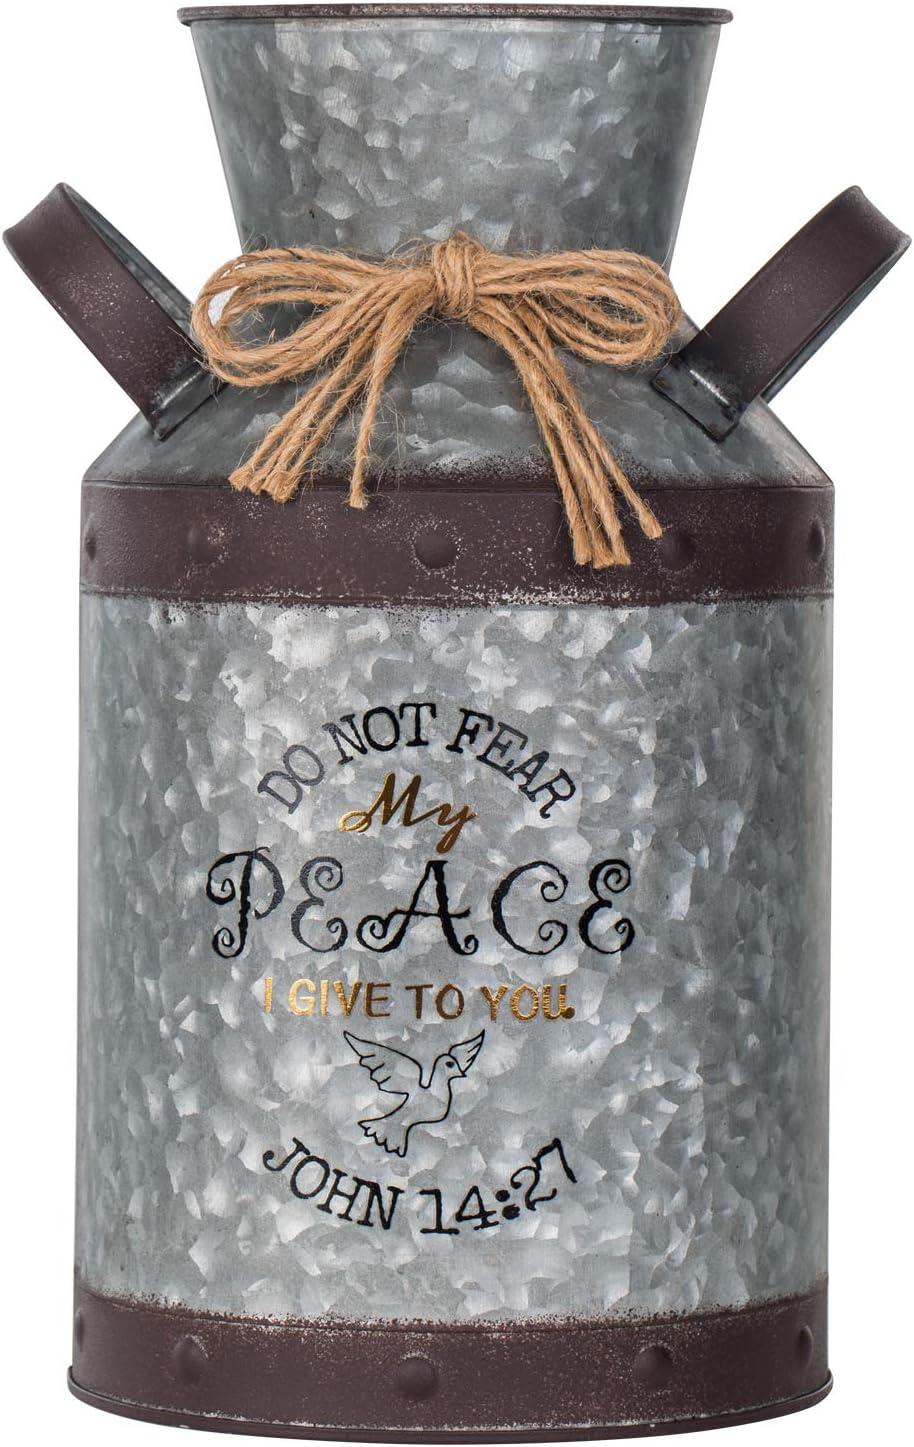 Decorative Galvanized-Metal Can Garden Decoration Gardening Gift Souvenir Metal Flower Pot Vase